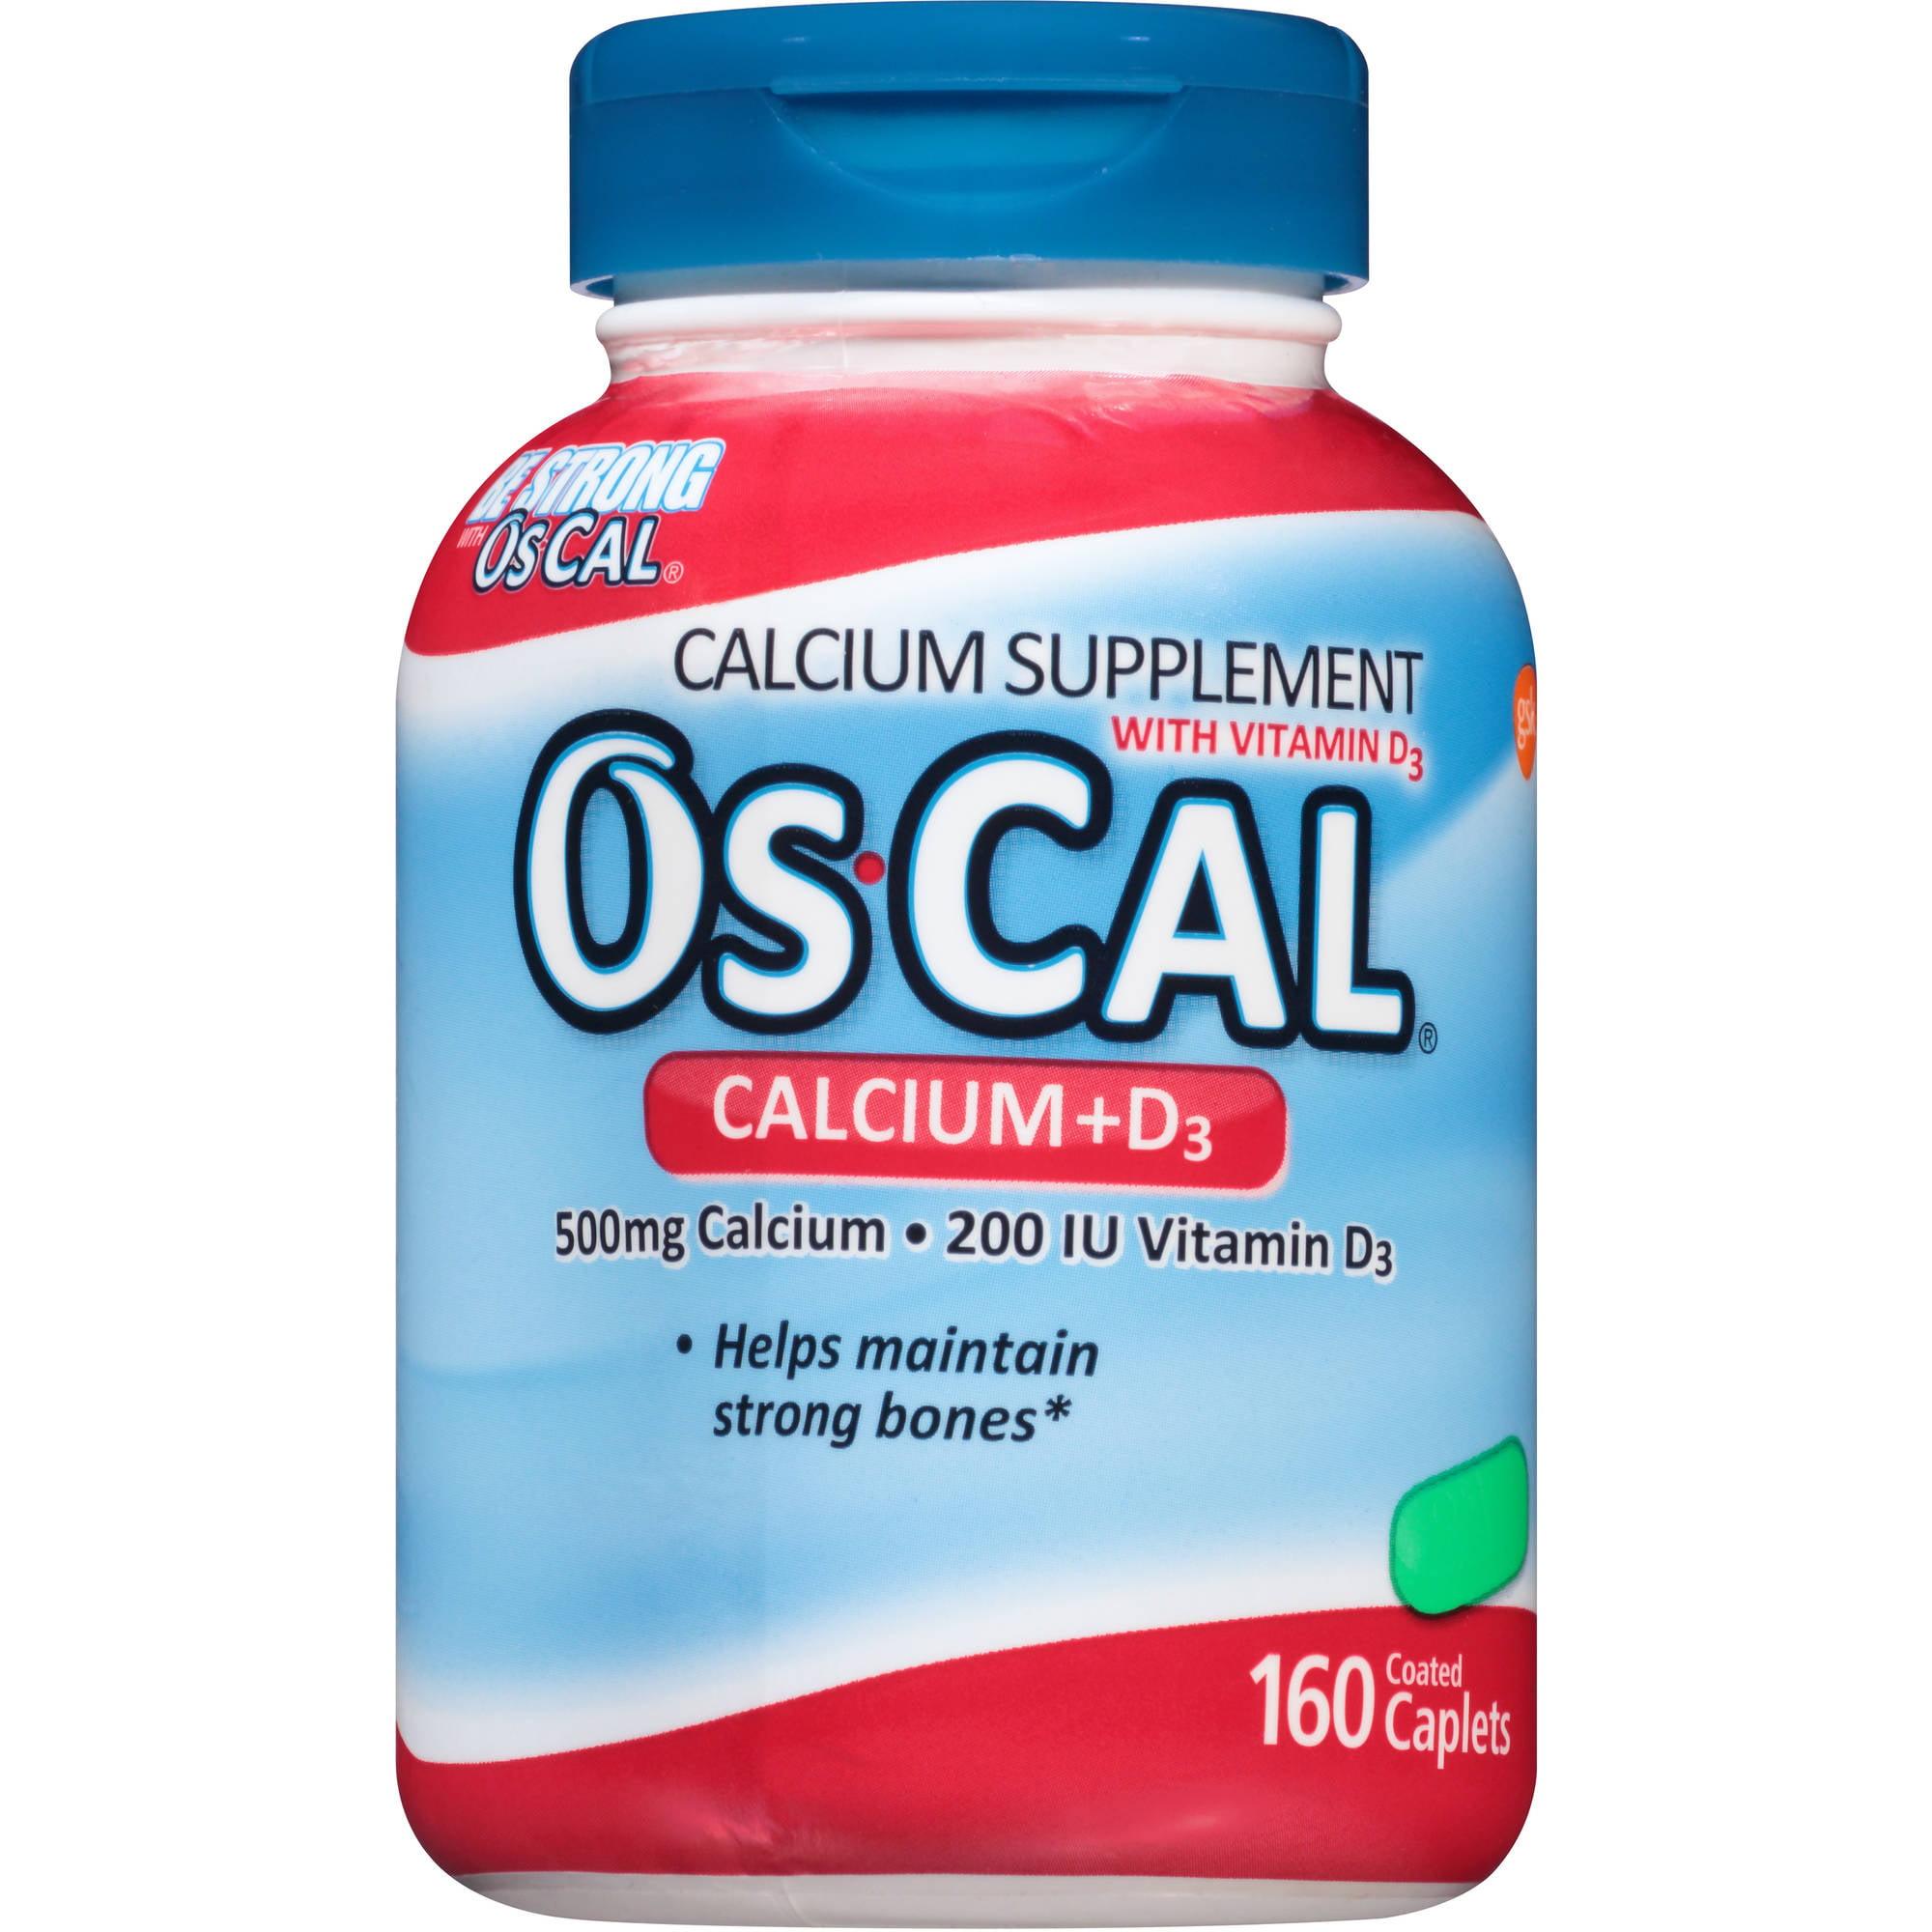 Os-Cal Calcium And Vitamin D3, Calcium Supplements, Coated Caplets, 160 Count